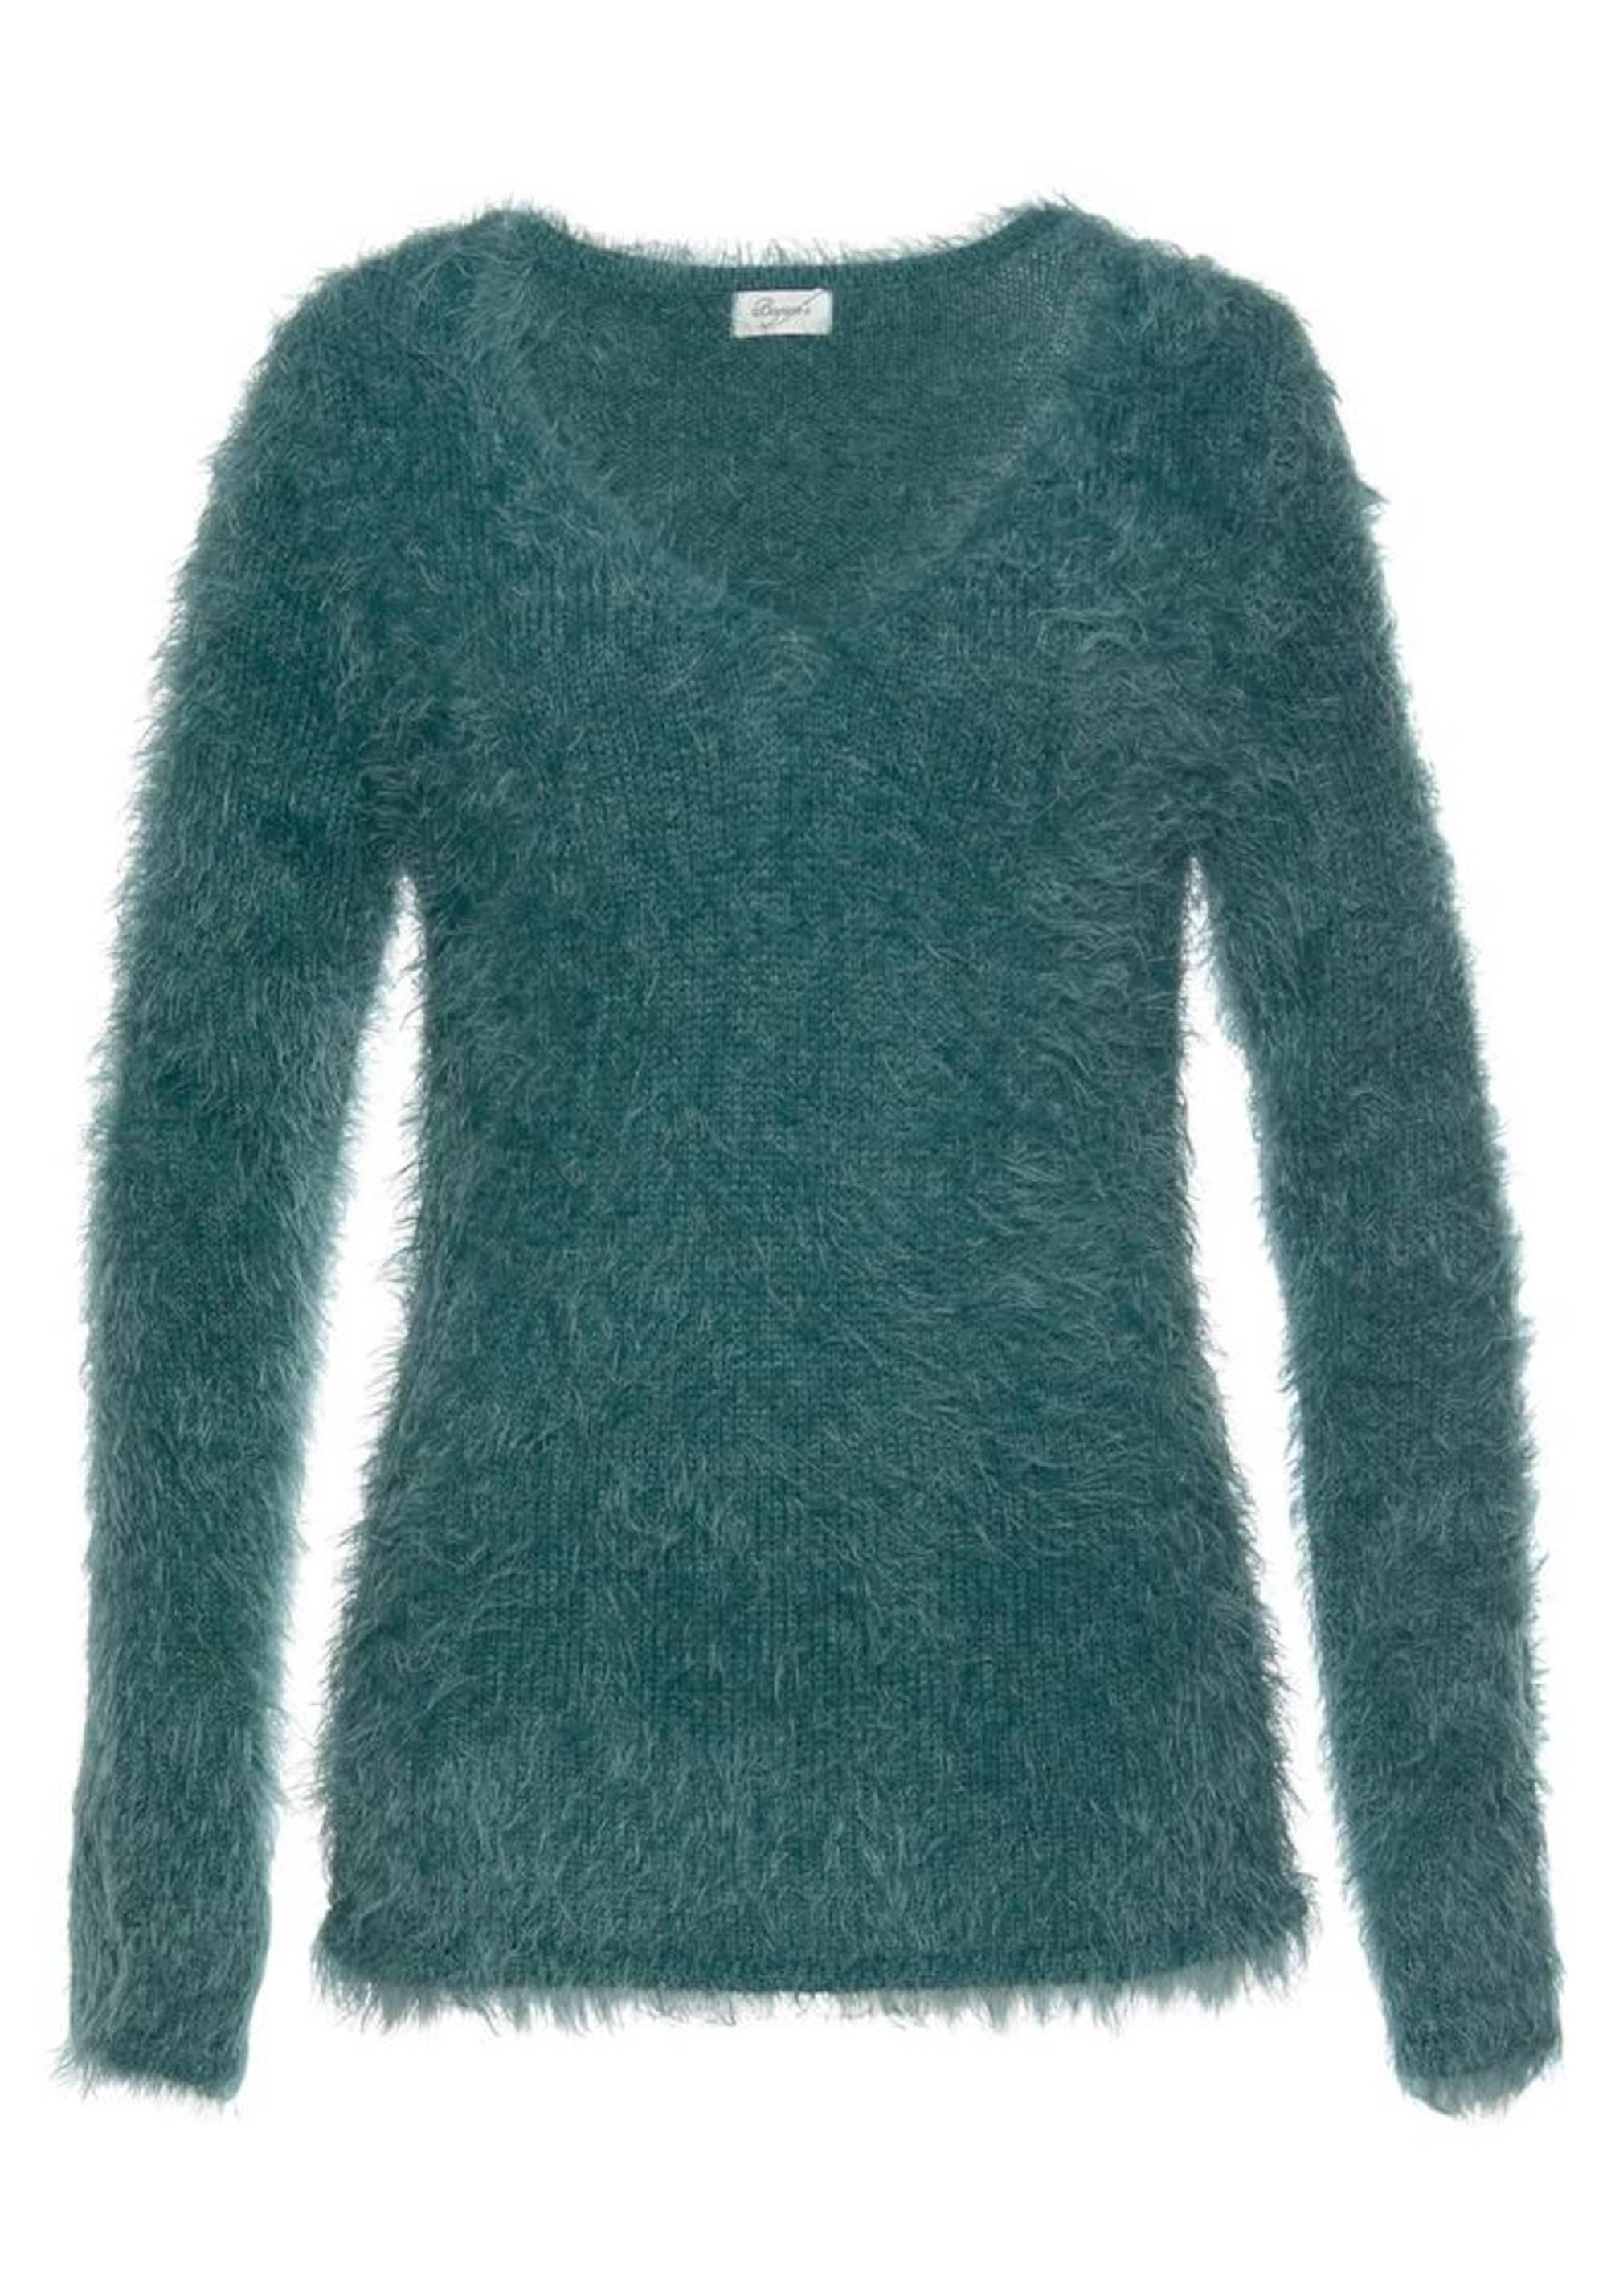 boysen´s - Pullover